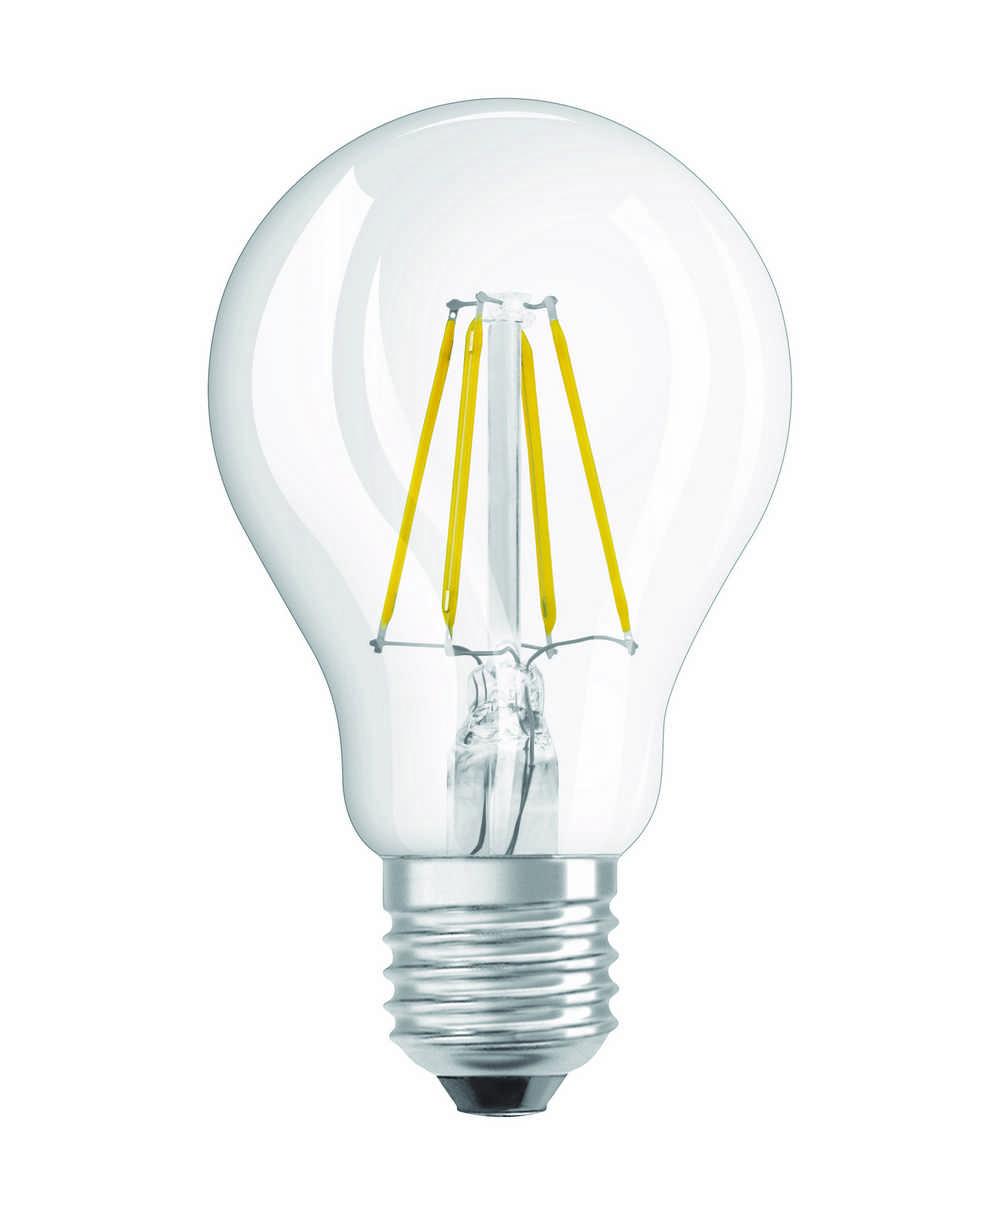 LED RETROF CLA40 E27 4W WW HELD FIL